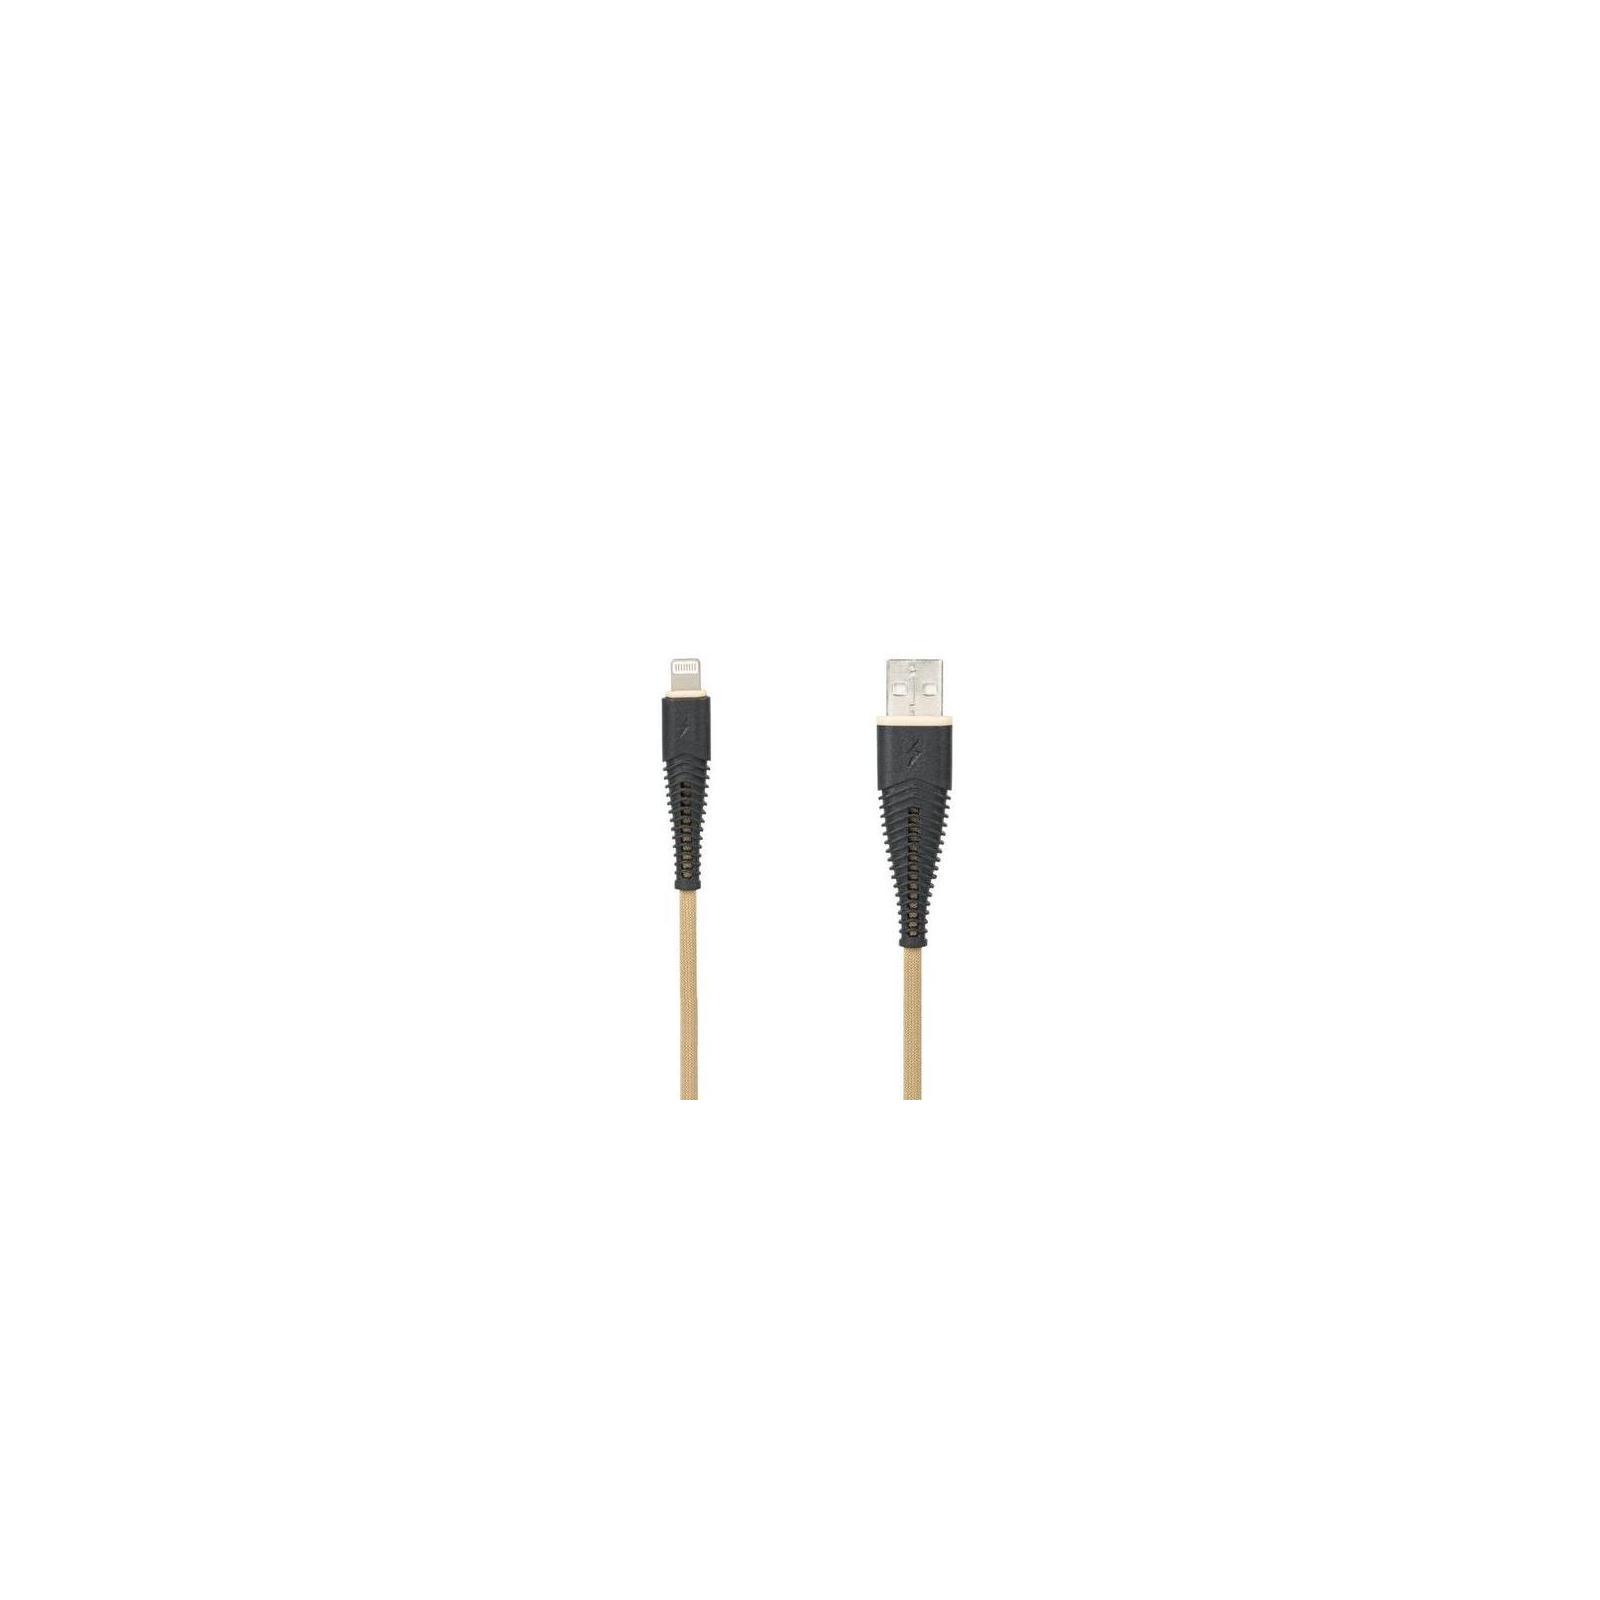 Дата кабель USB 2.0 AM to Lightning Pro Amaze 2A Gold Gelius (65128)